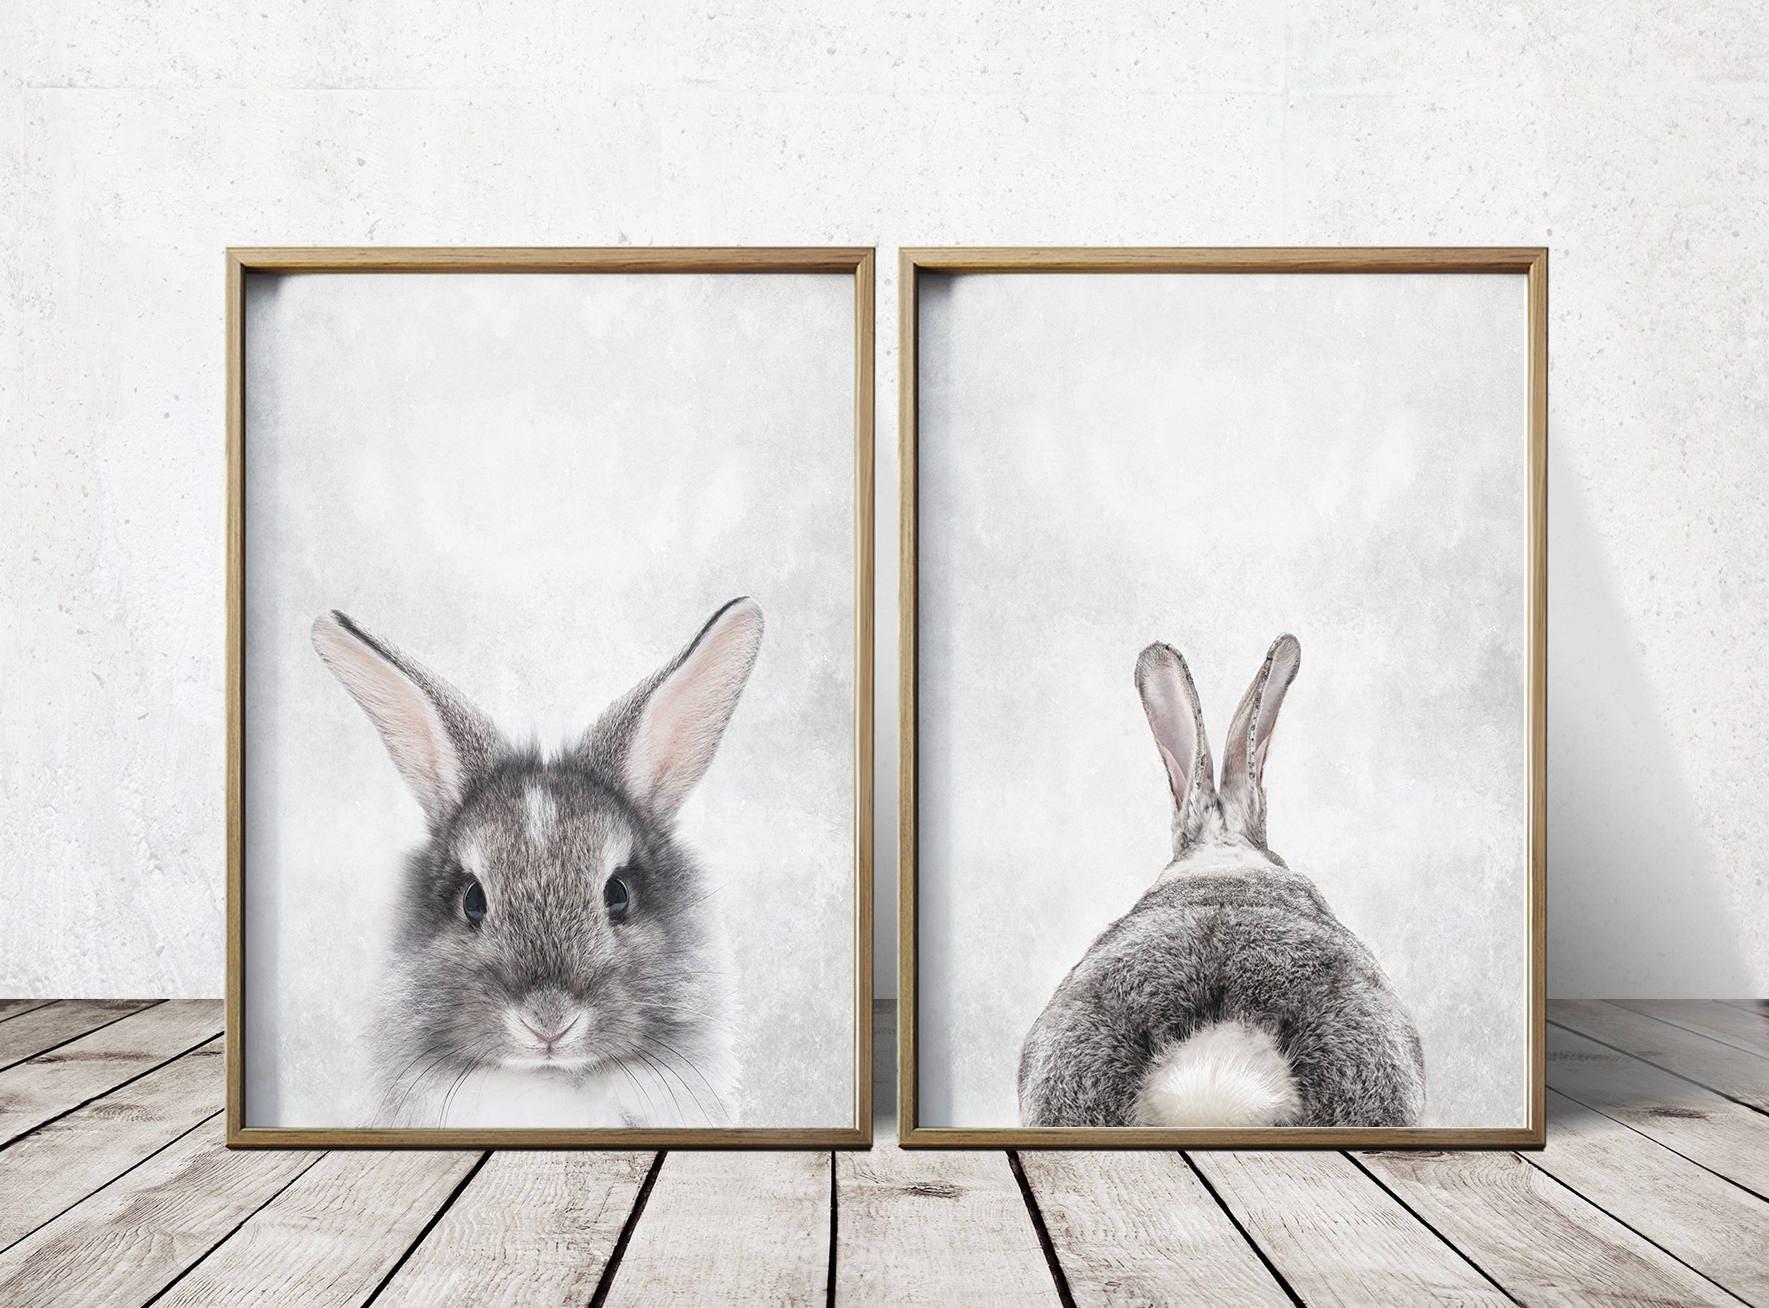 Jual Wall Art Print : Nursery wall art decor gray rabbit print bunny